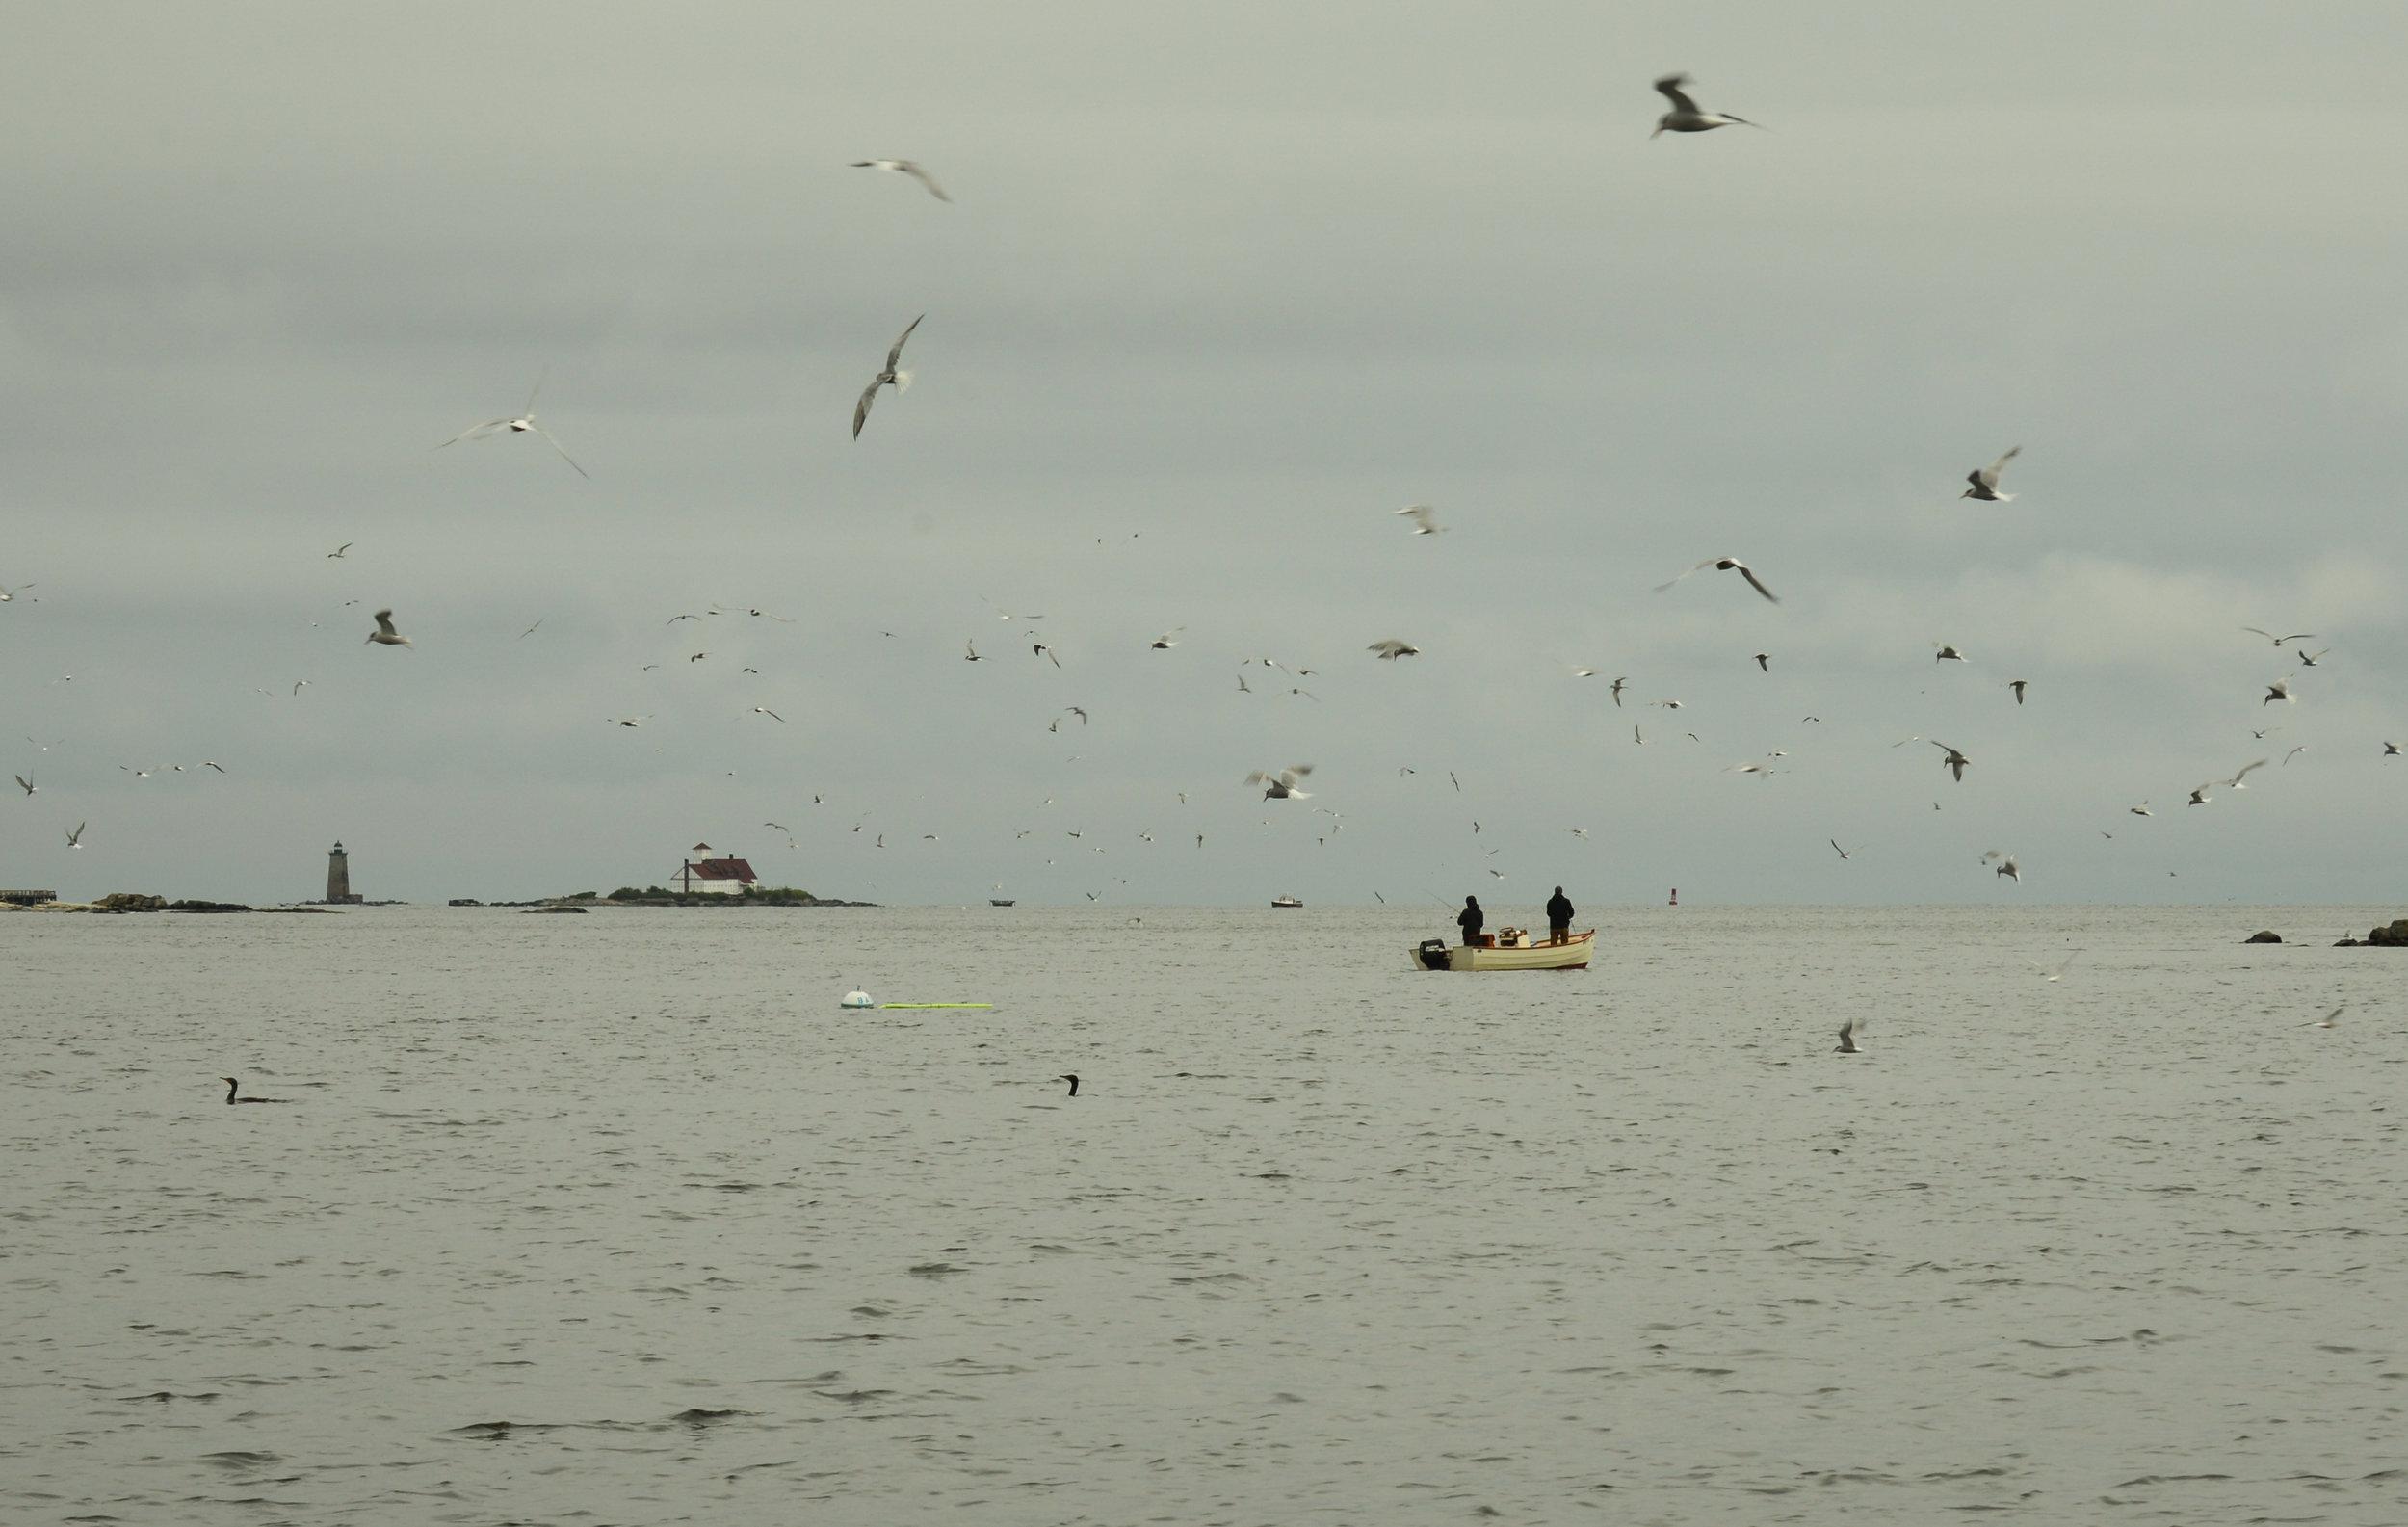 Early season flutter of activity. Photo:  Kyle Schaefer